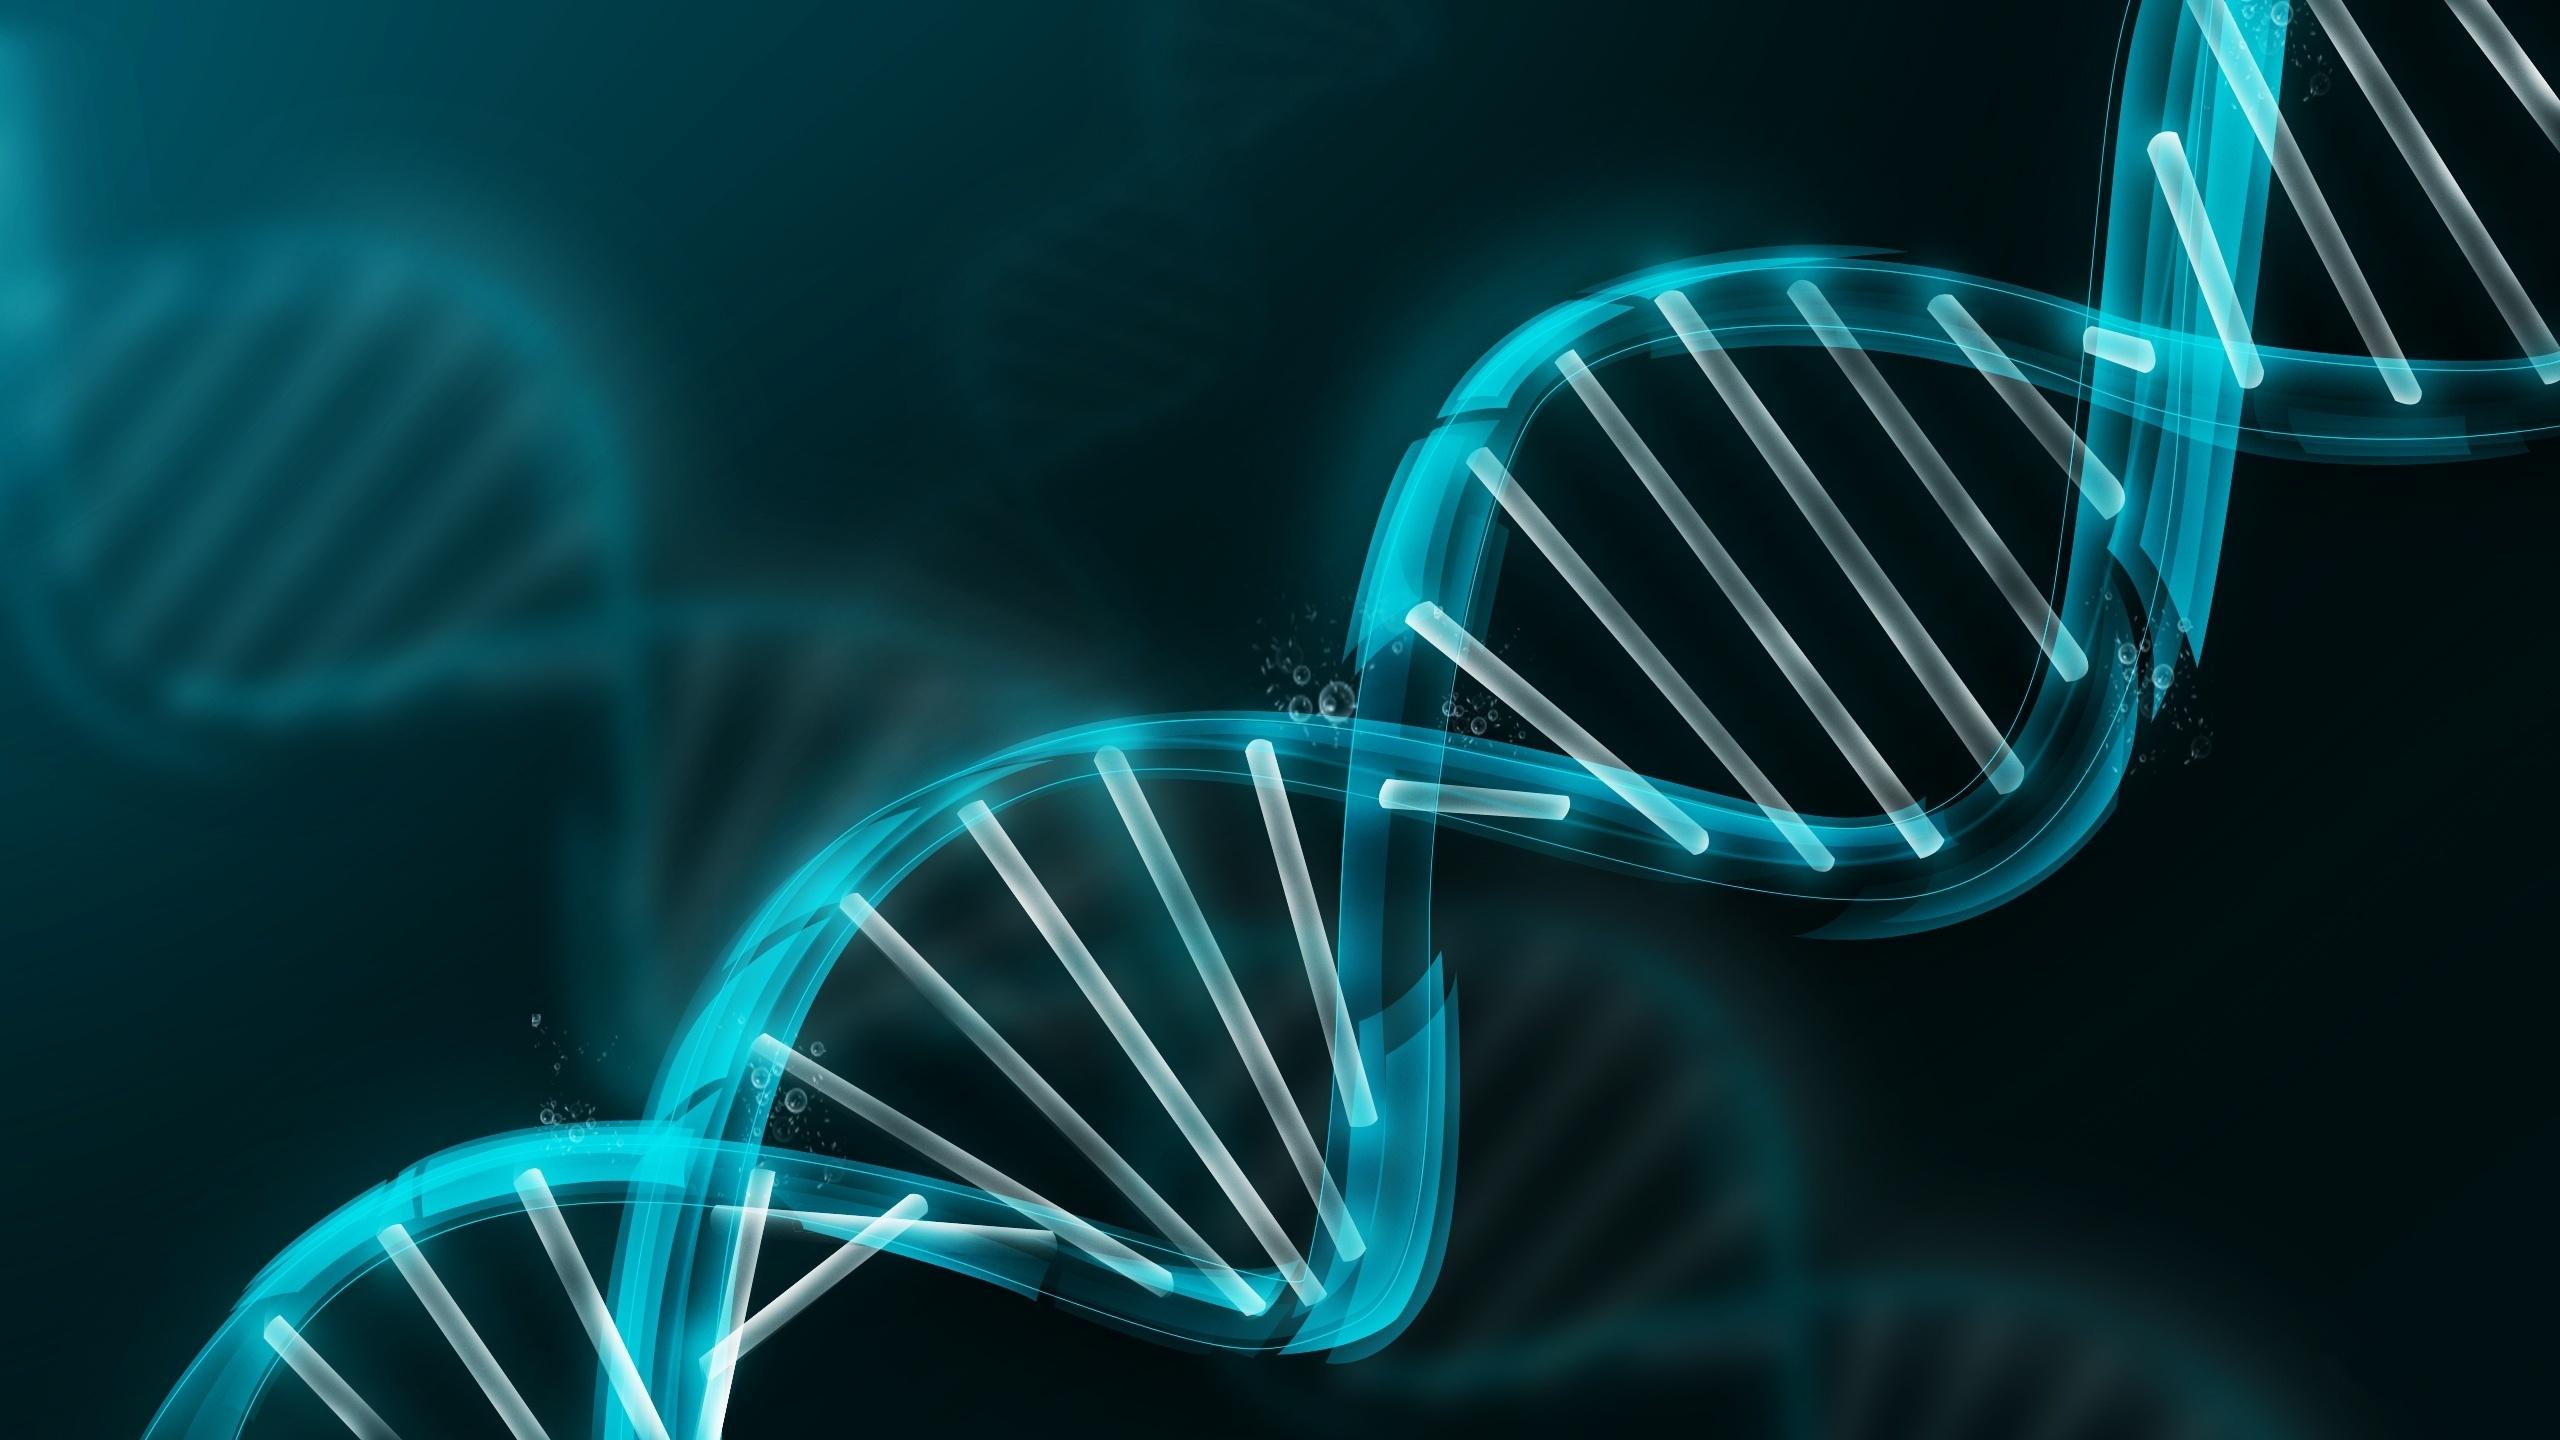 Biology Genes Wallpaper Background 13173 2560x1440   uMadcom 2560x1440